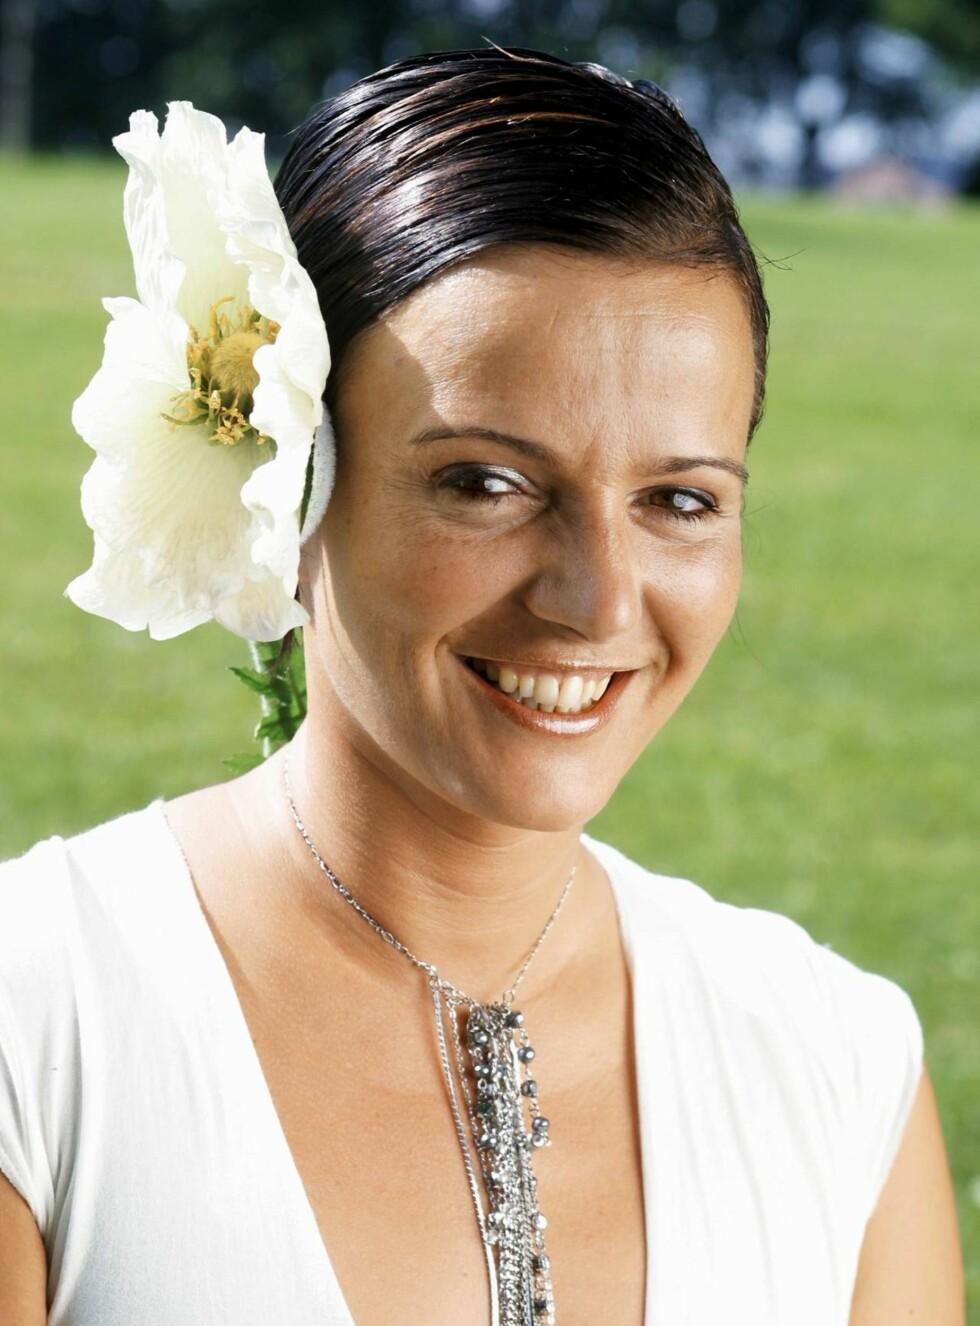 SA JA: Humørsprederen Synnøve Svabø giftet seg i Haugesund. Foto: Tore Skaar, Se og Hør